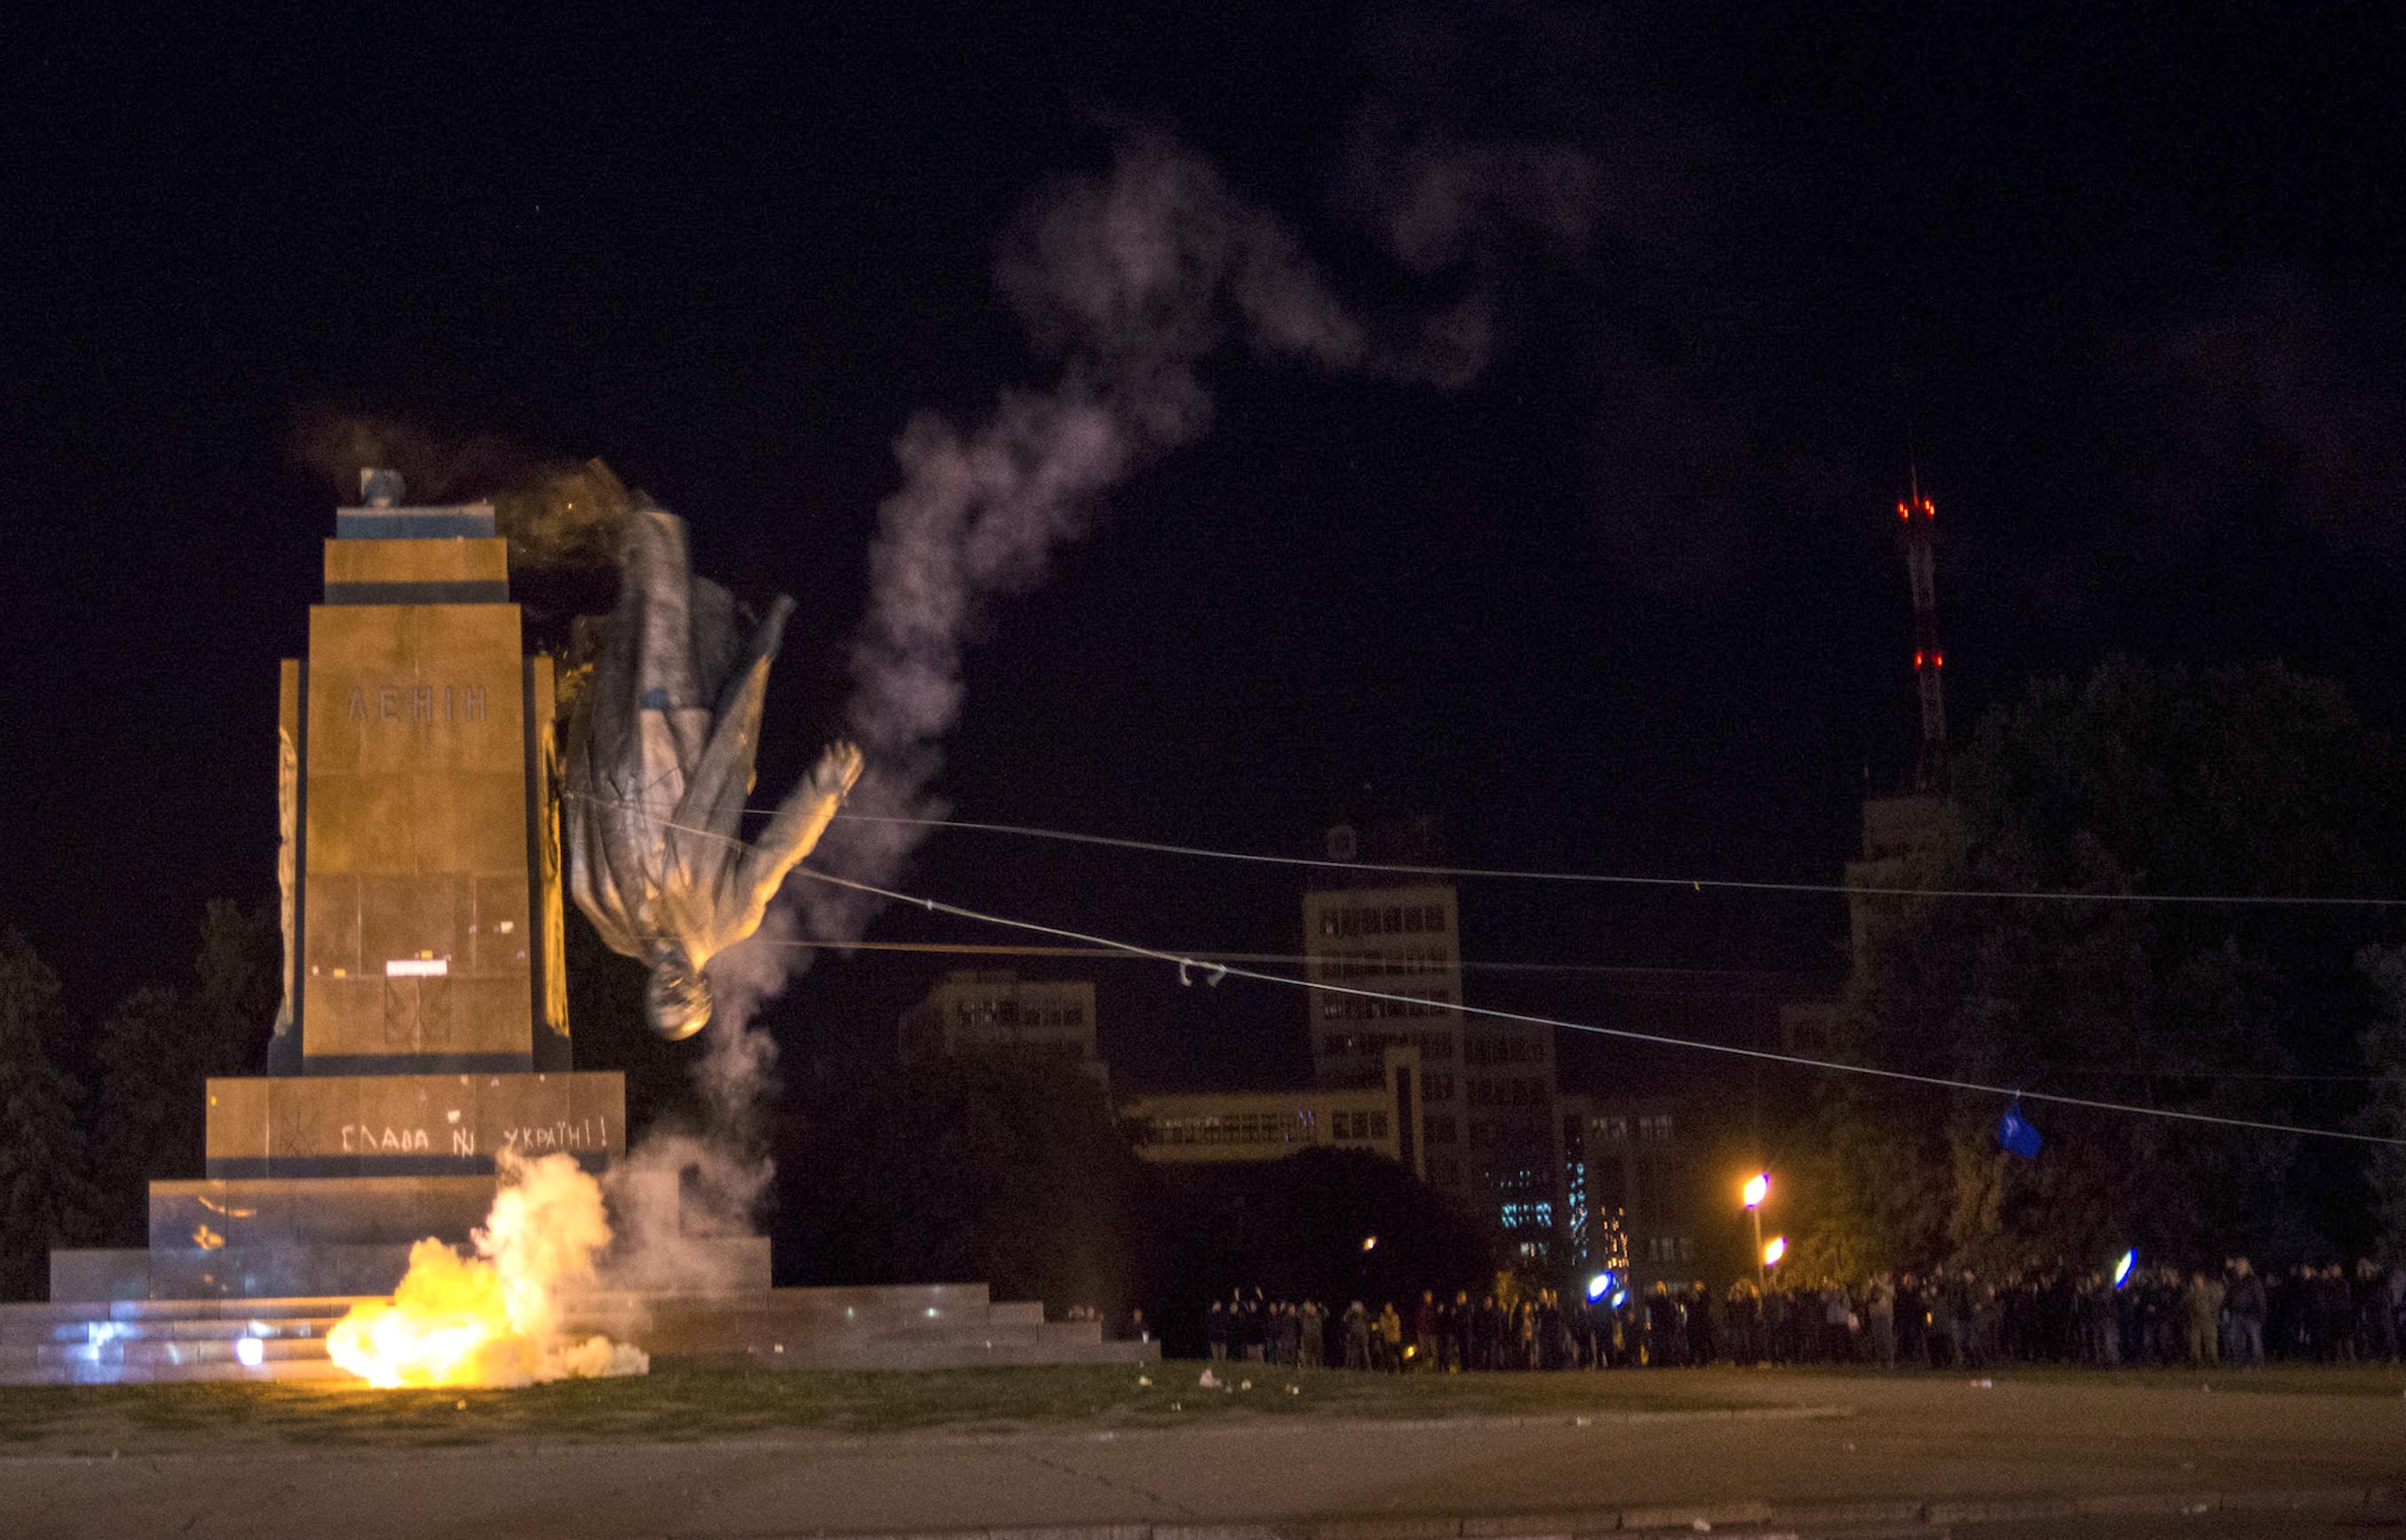 Activists dismantle Ukraine's biggest monument to Lenin at a pro-Ukrainian rally in the eastern Ukrainian city of Kharkiv on Sept. 28, 2014